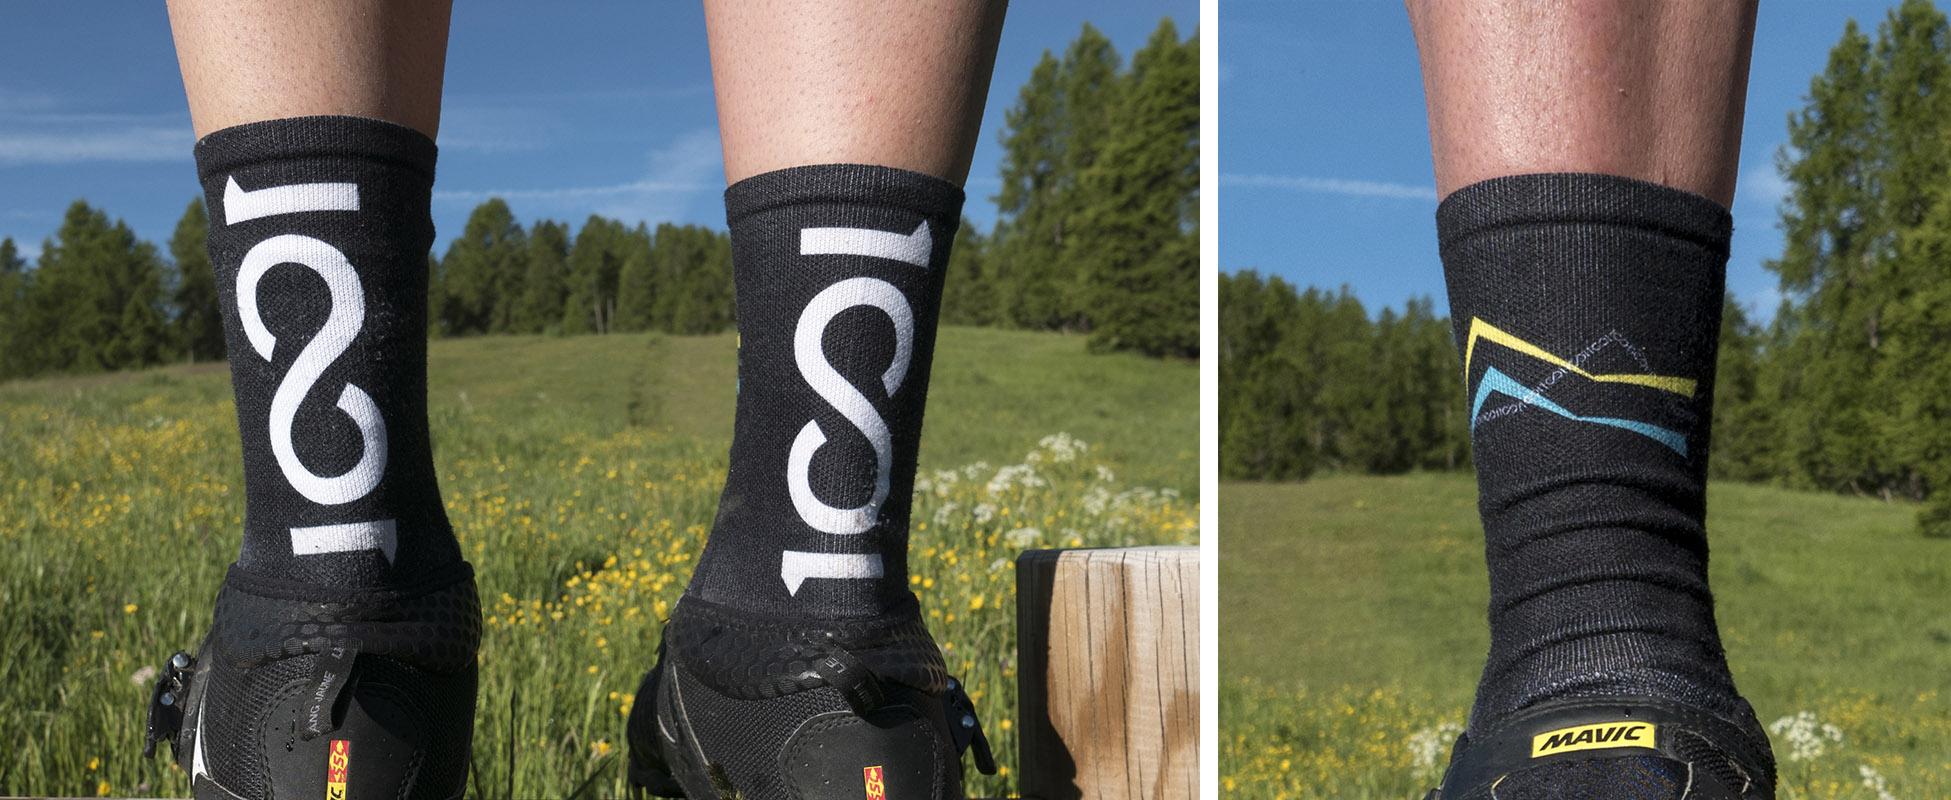 chaussettes socks vtt mtb 1001sentiers compo